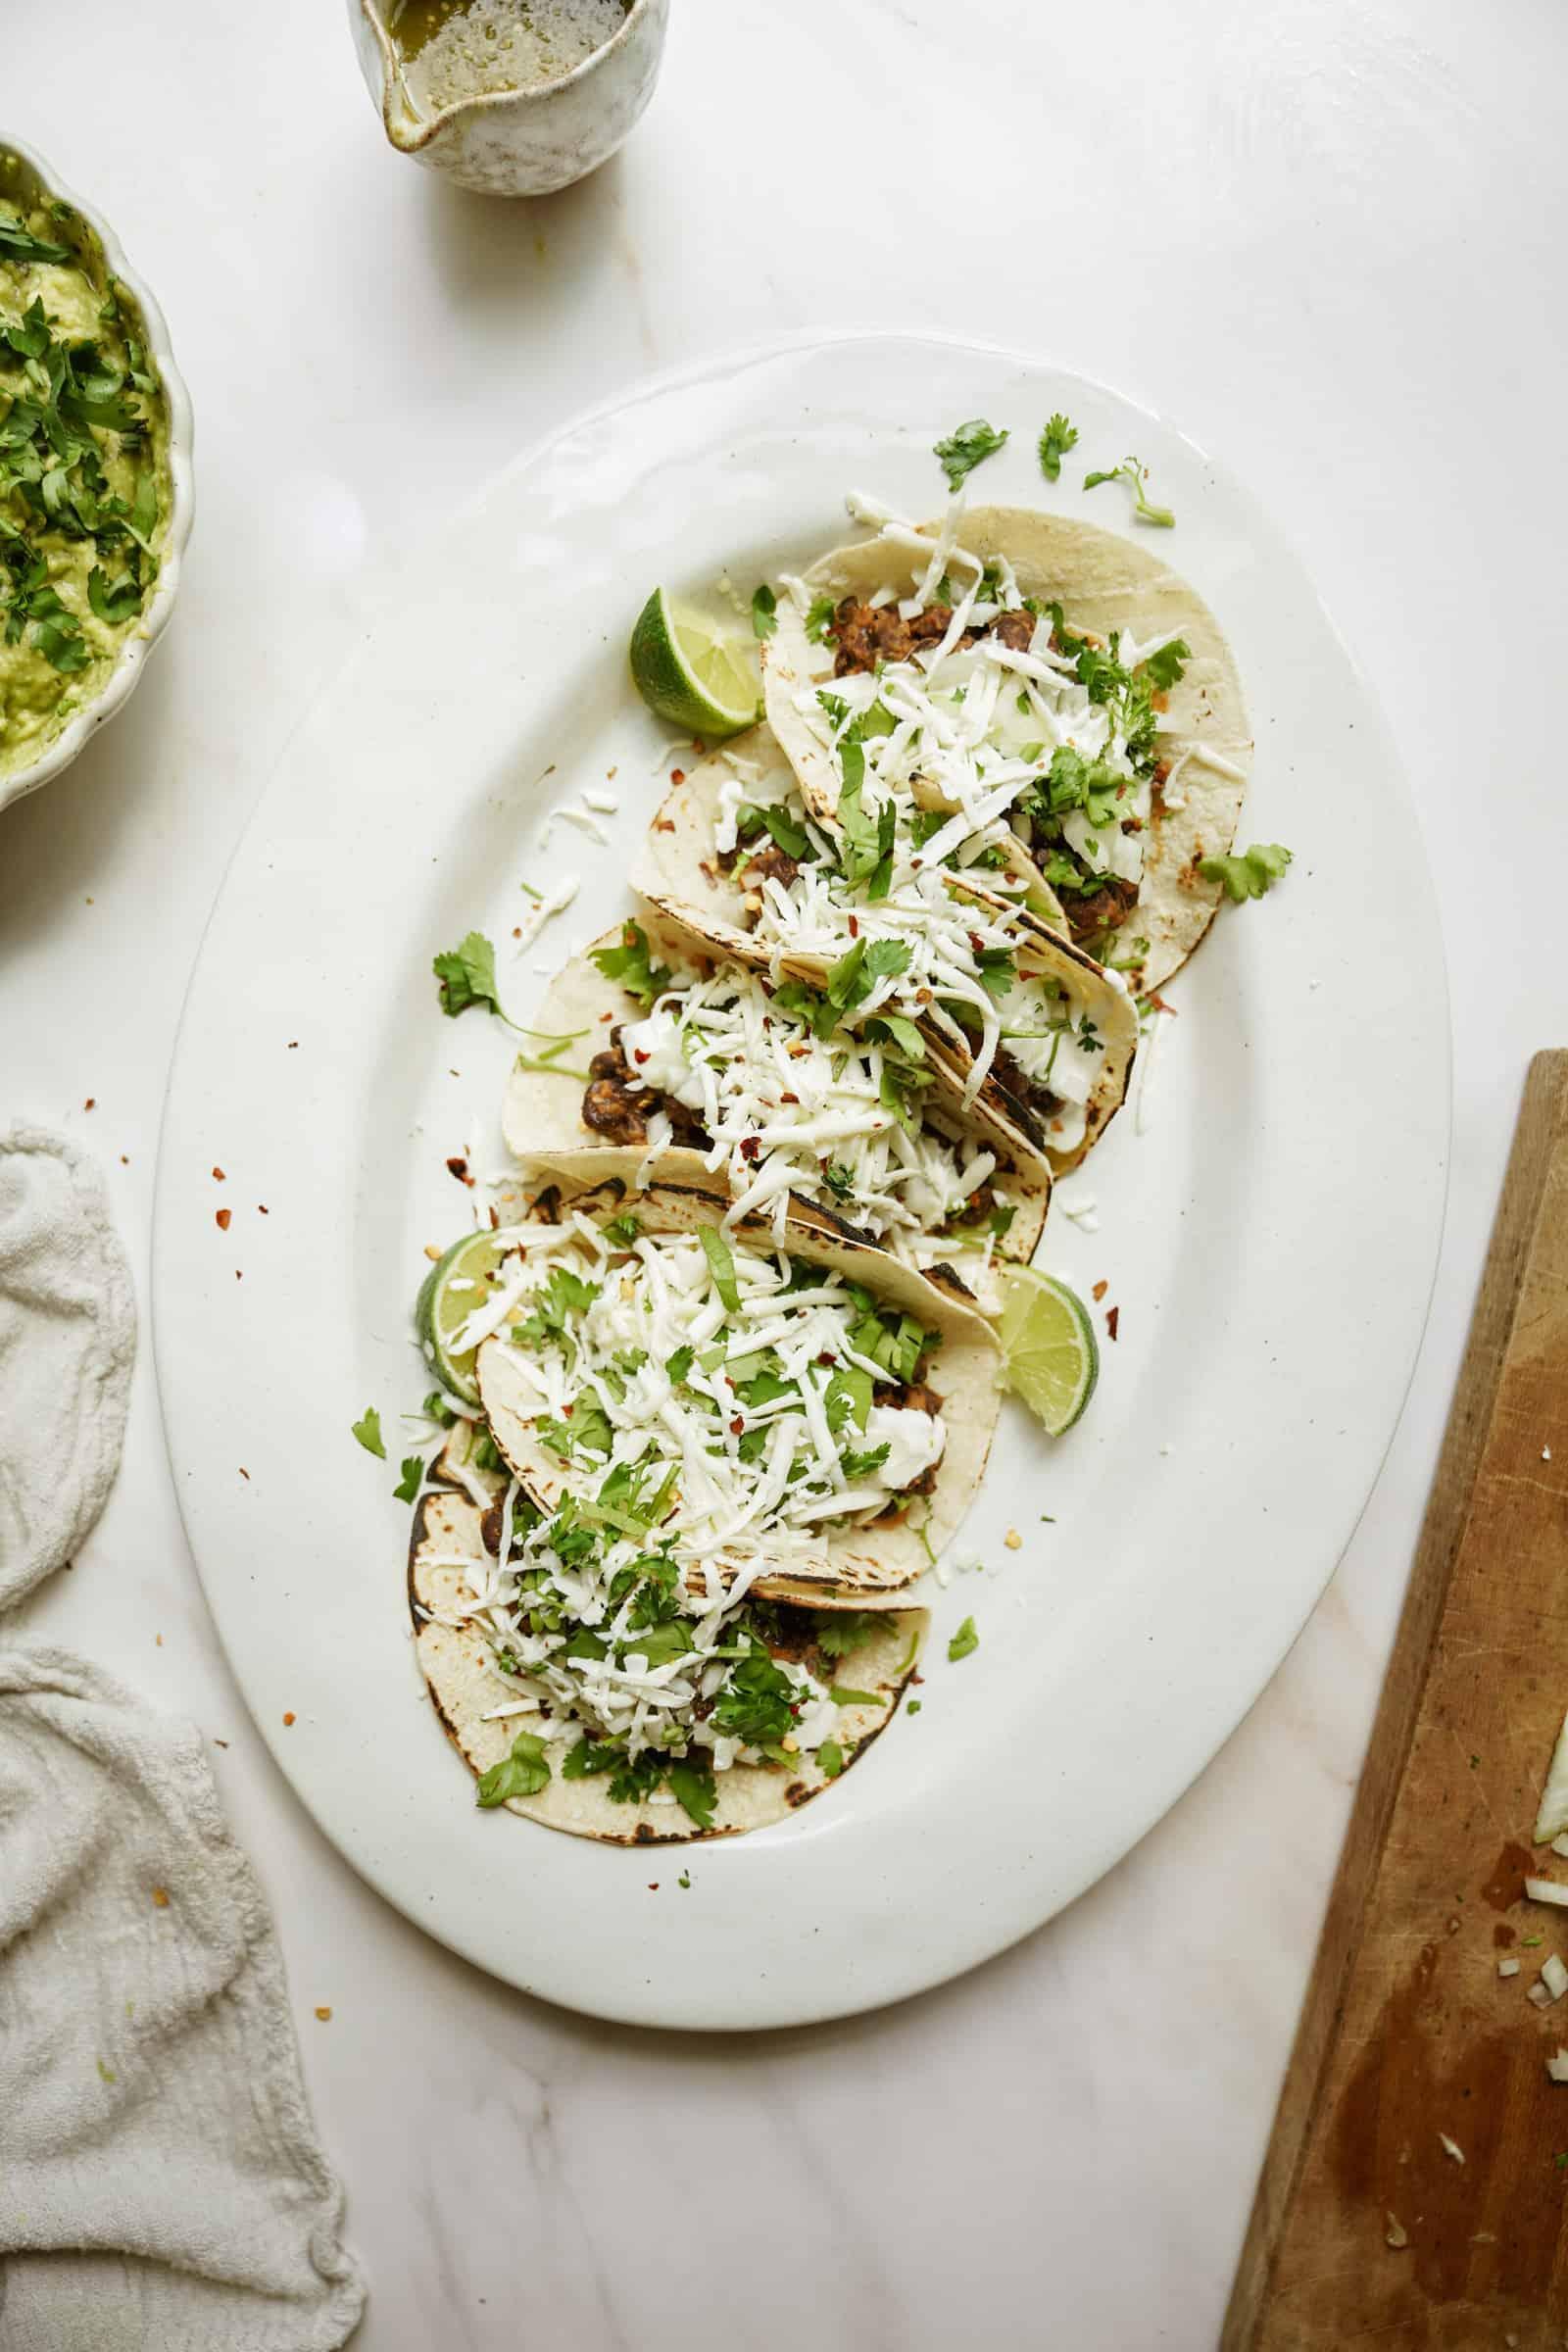 Vegetarian black bean tacos on a platter